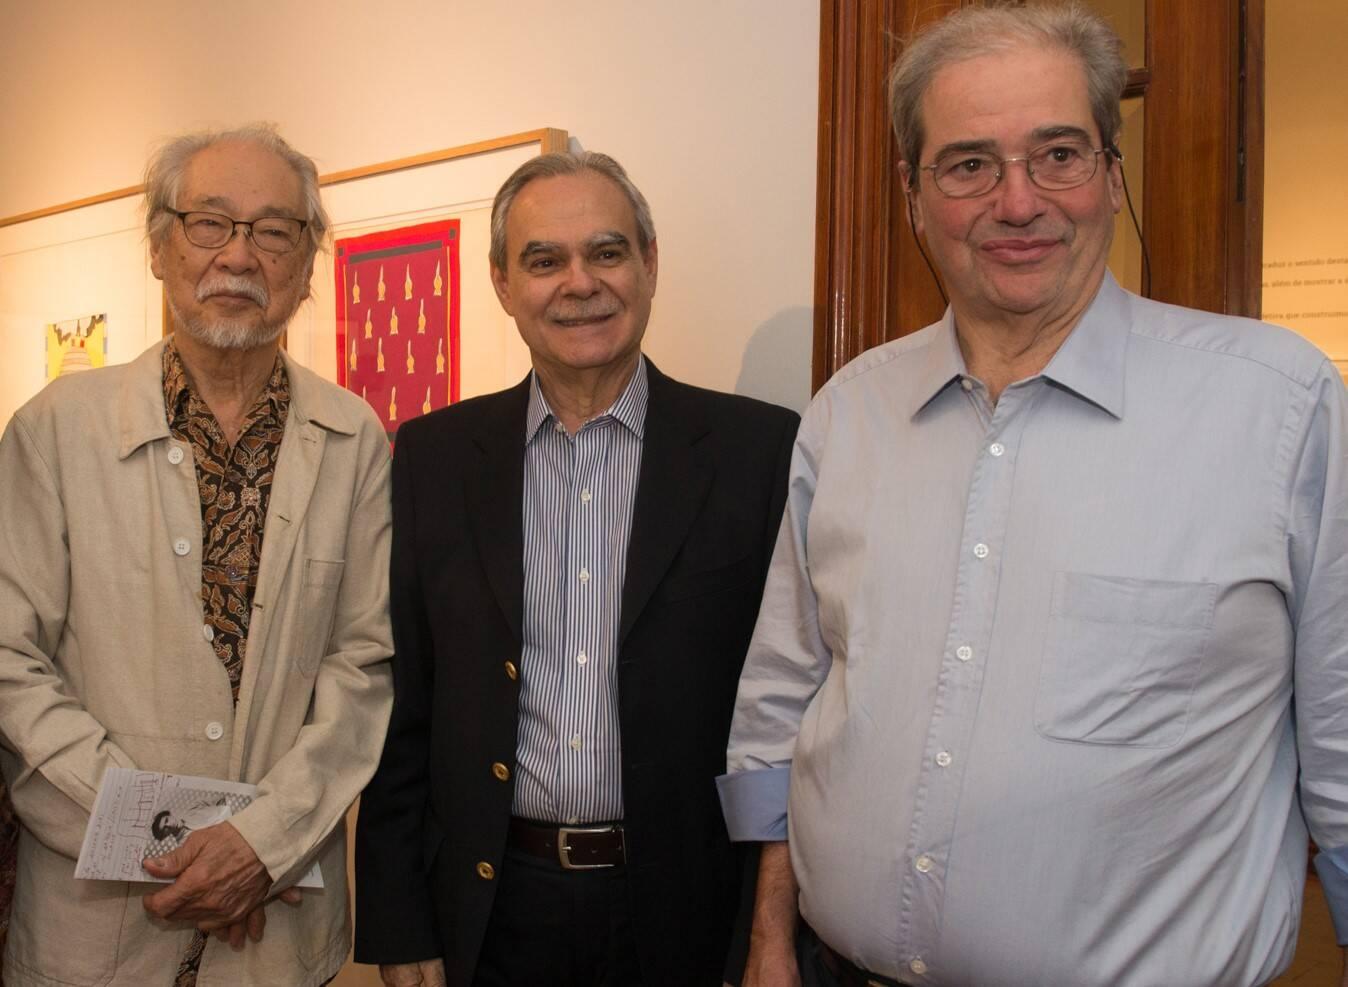 Shiró, Max Perlingeiro e Luiz Antonio de Almeida Braga /Foto: Cristina Lacerda